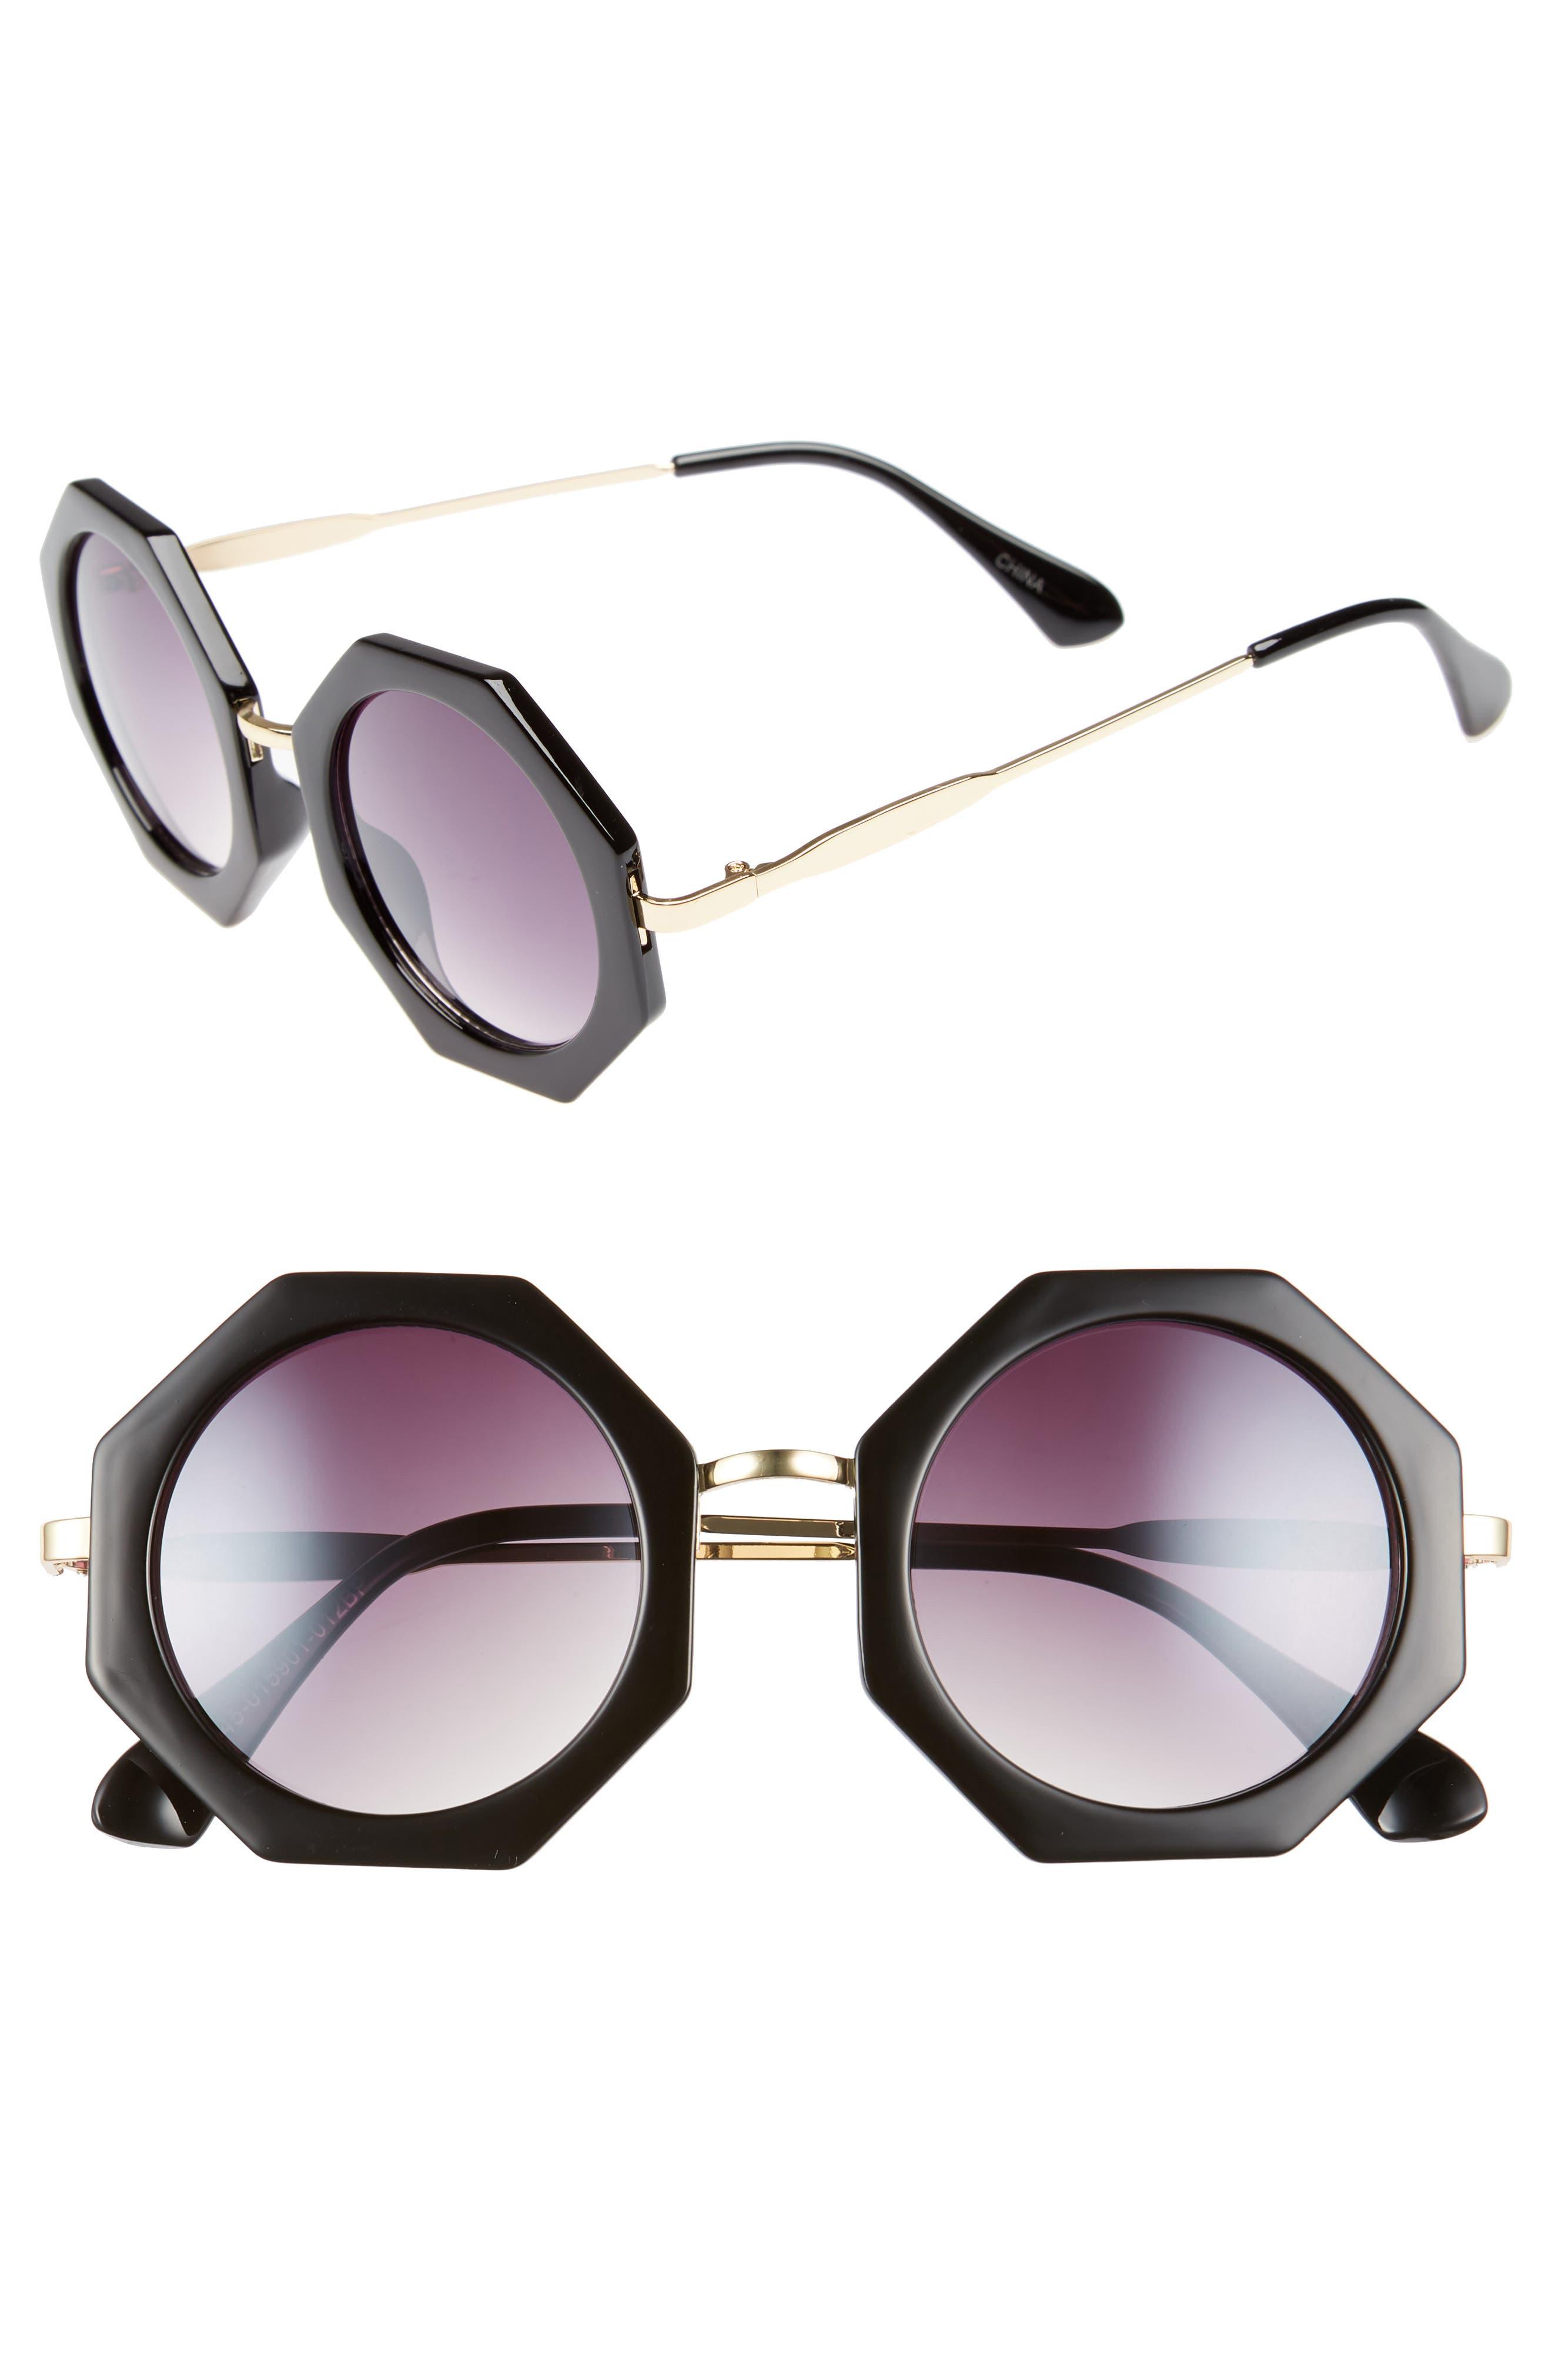 54m Hexagonal Sunglasses,                             Main thumbnail 1, color,                             Black/ Gold